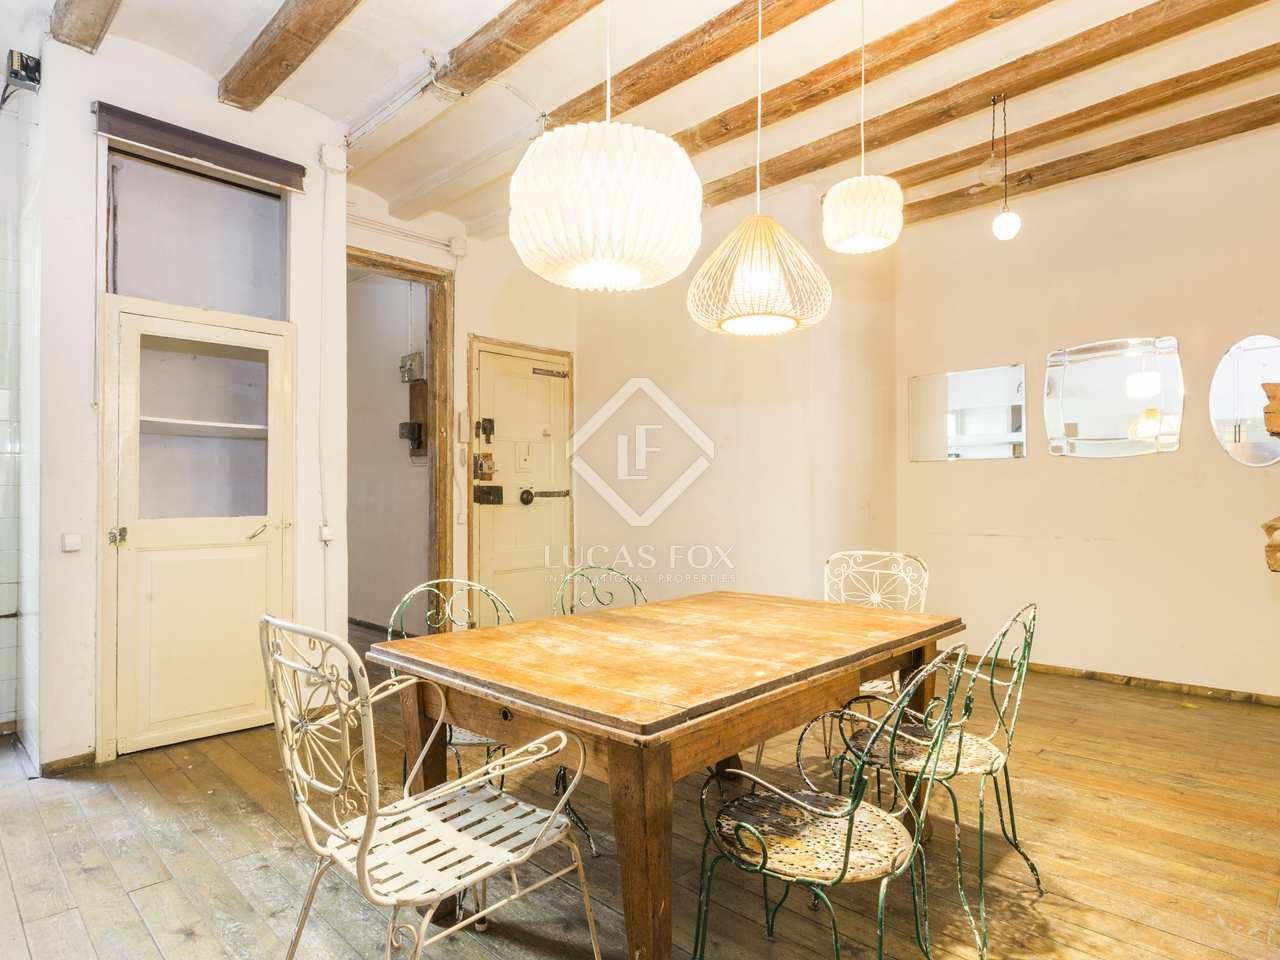 Appartement de 110m a vendre g tico barcelone for Appartement avec piscine barcelone